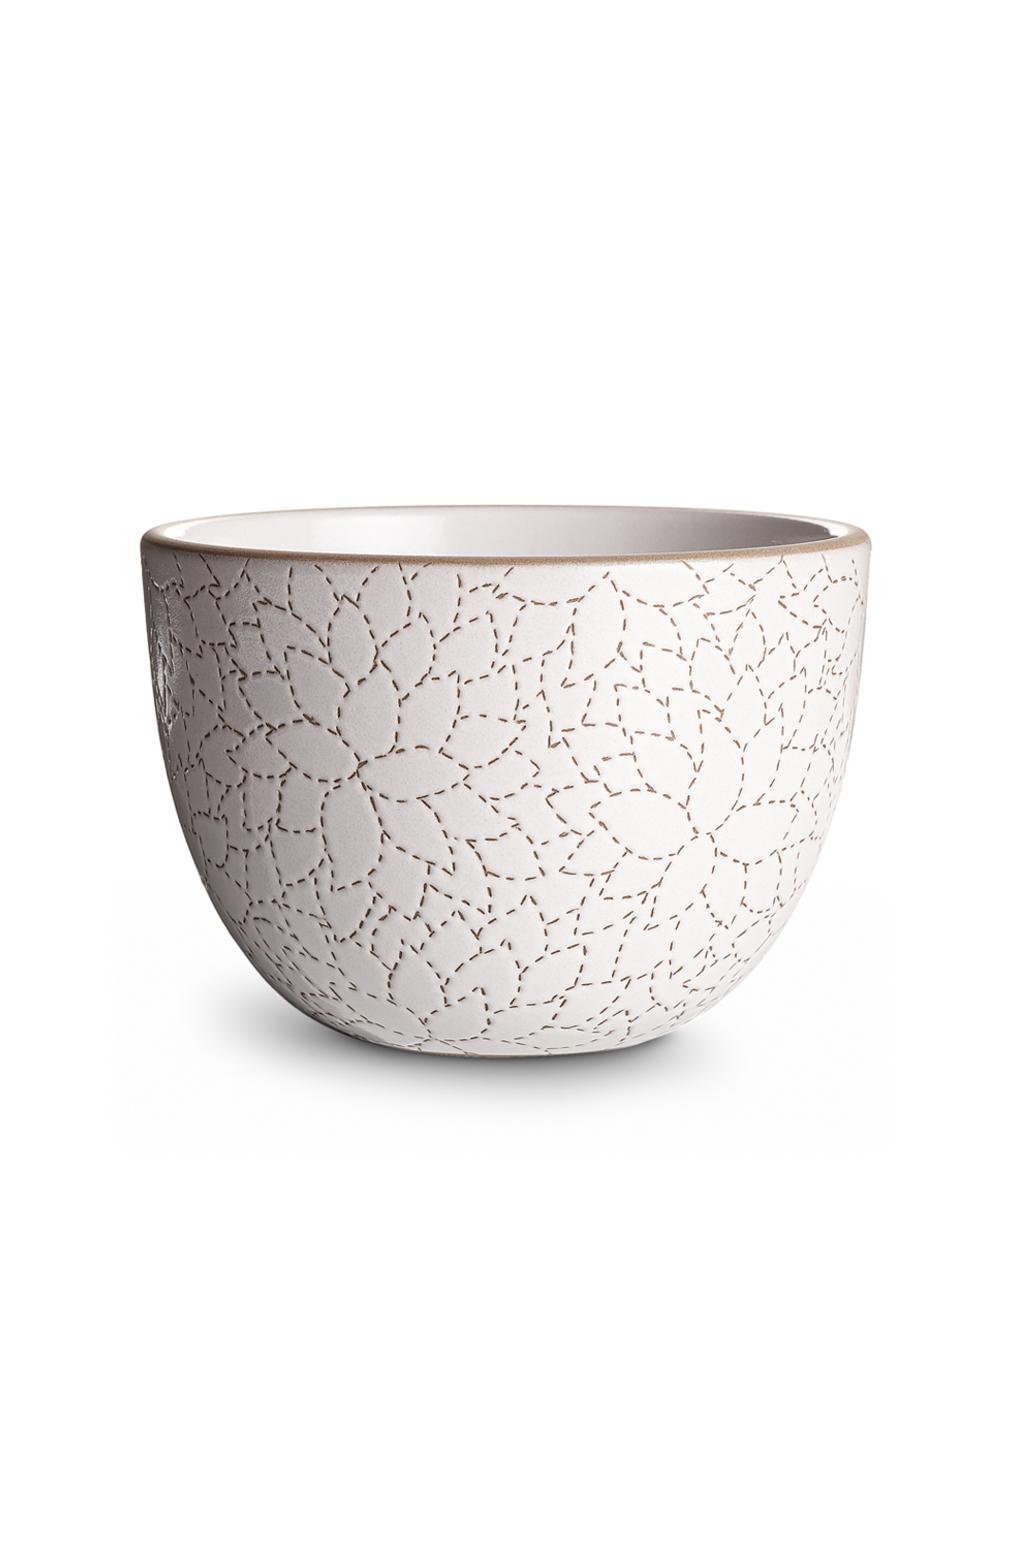 Heath ceramics alabama chanin camellia etched deep serving bowl